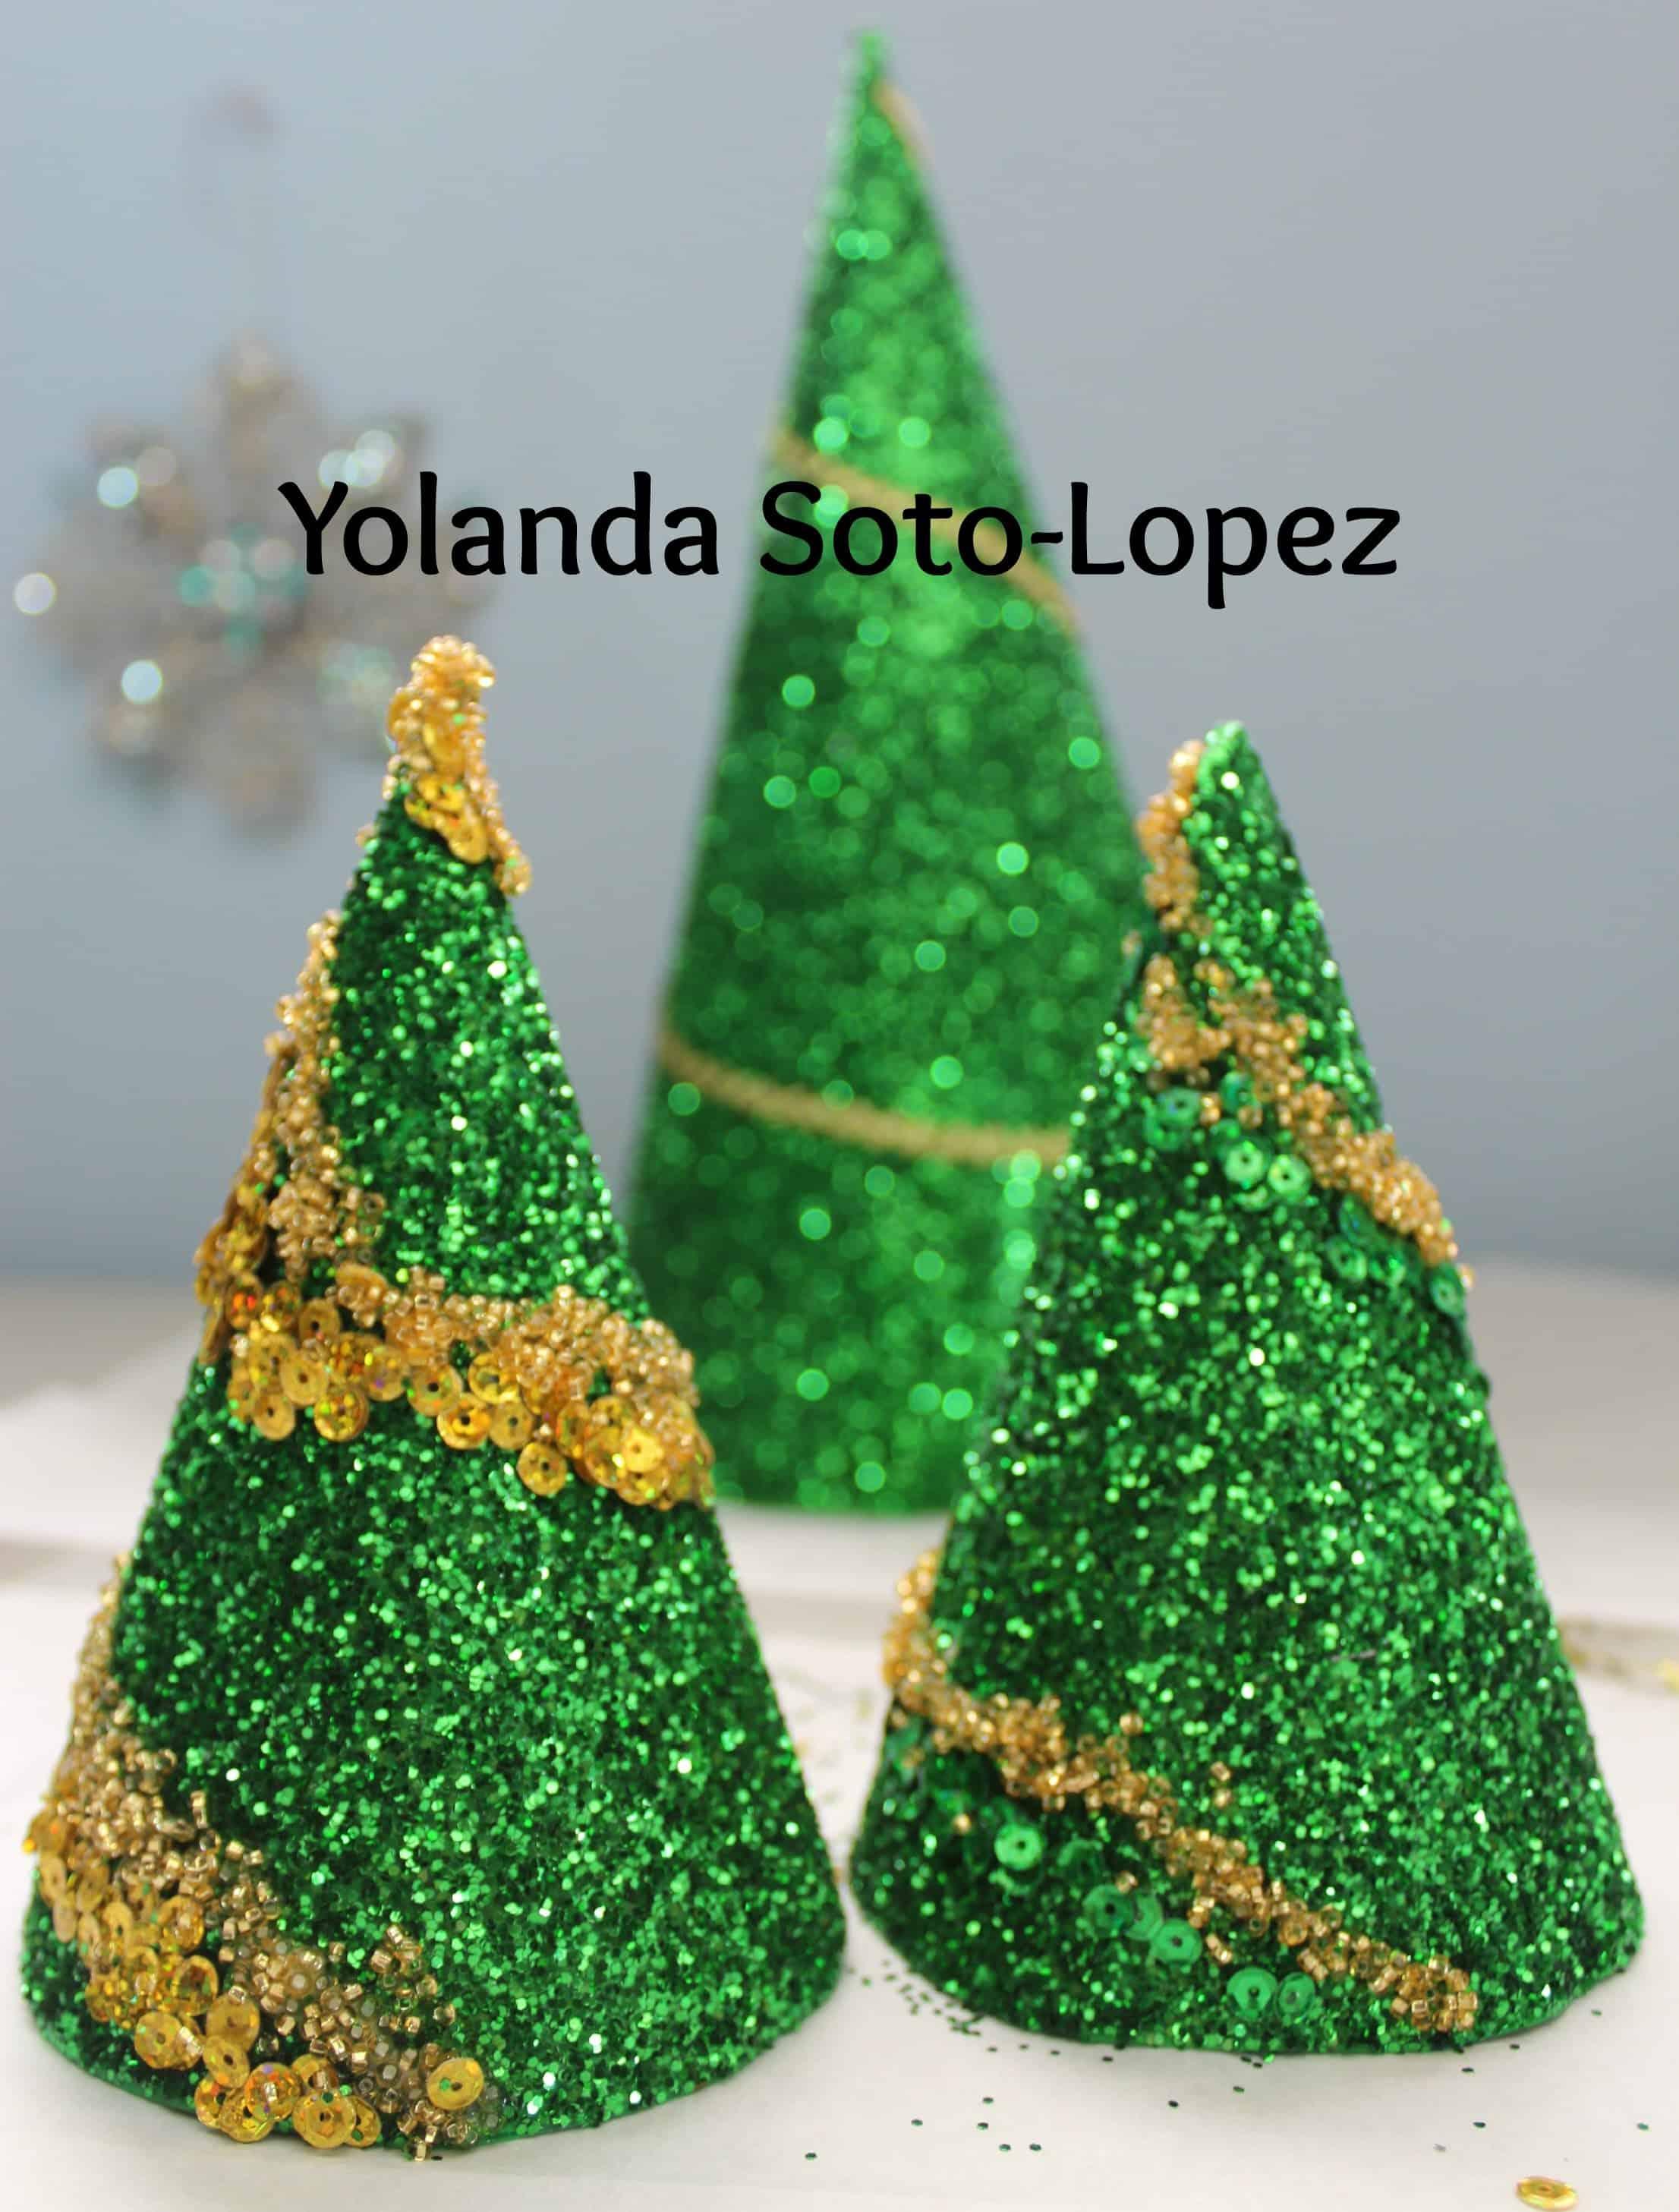 Sparkly Christmas tree cones